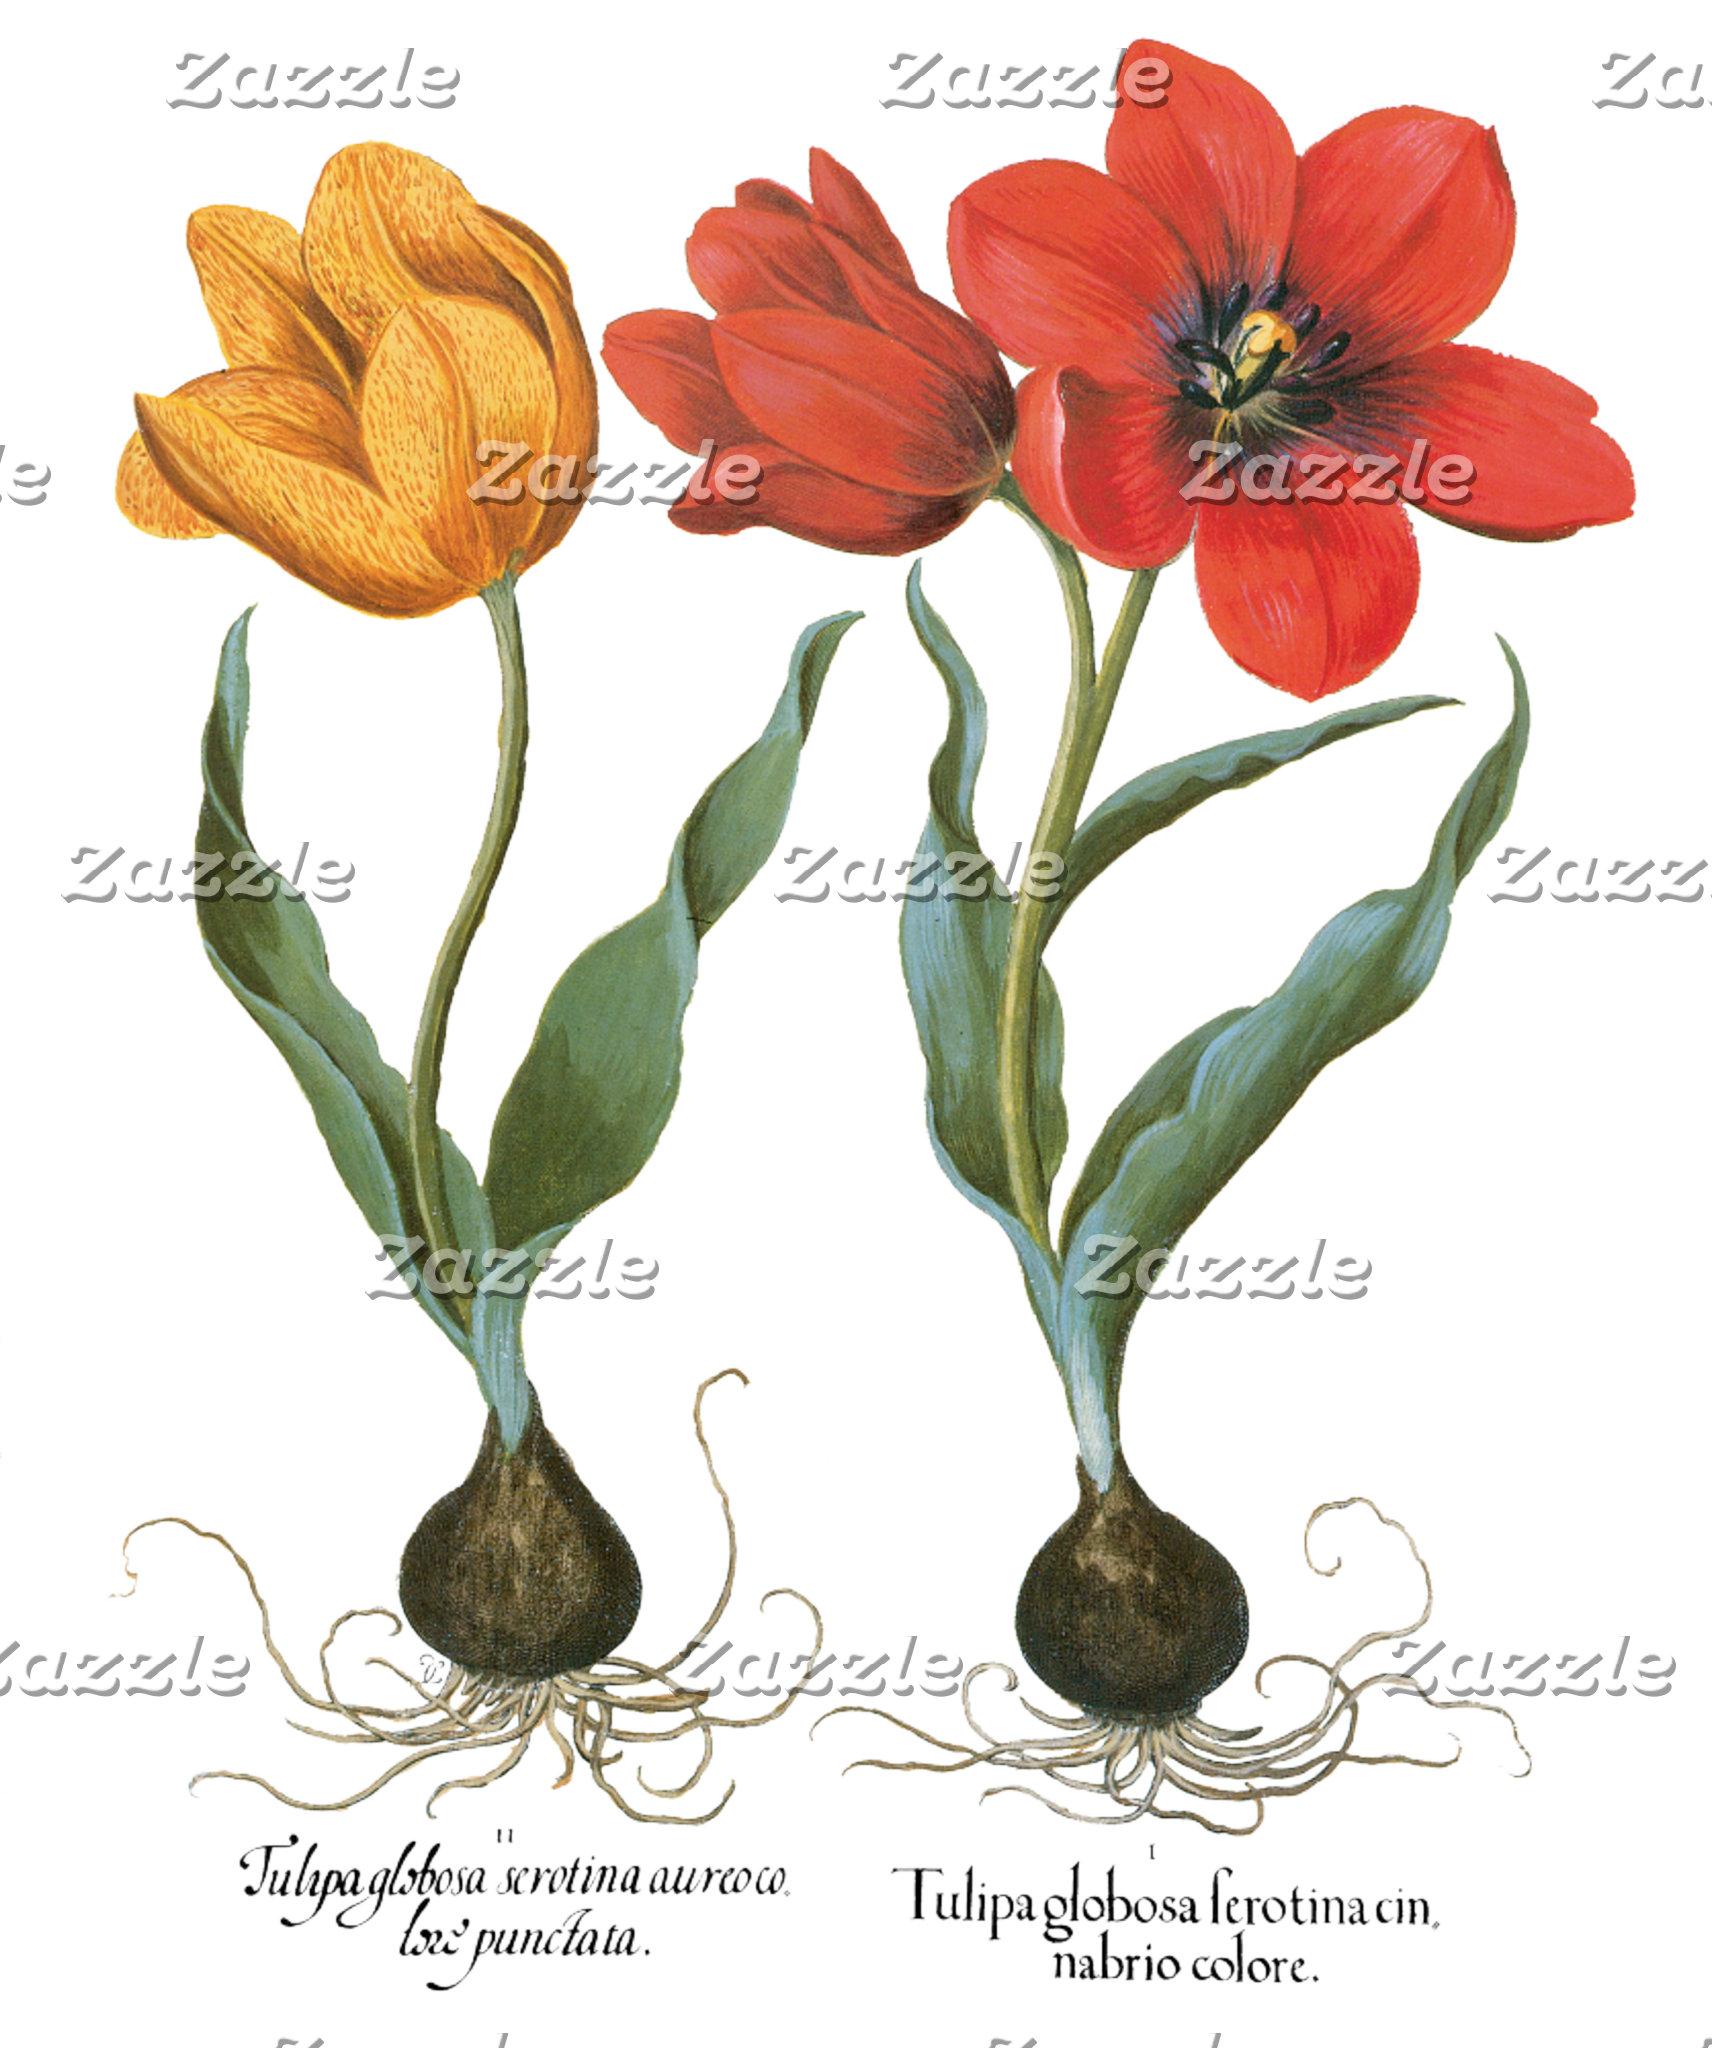 Botanical Art, Flowers and Garden Scenes